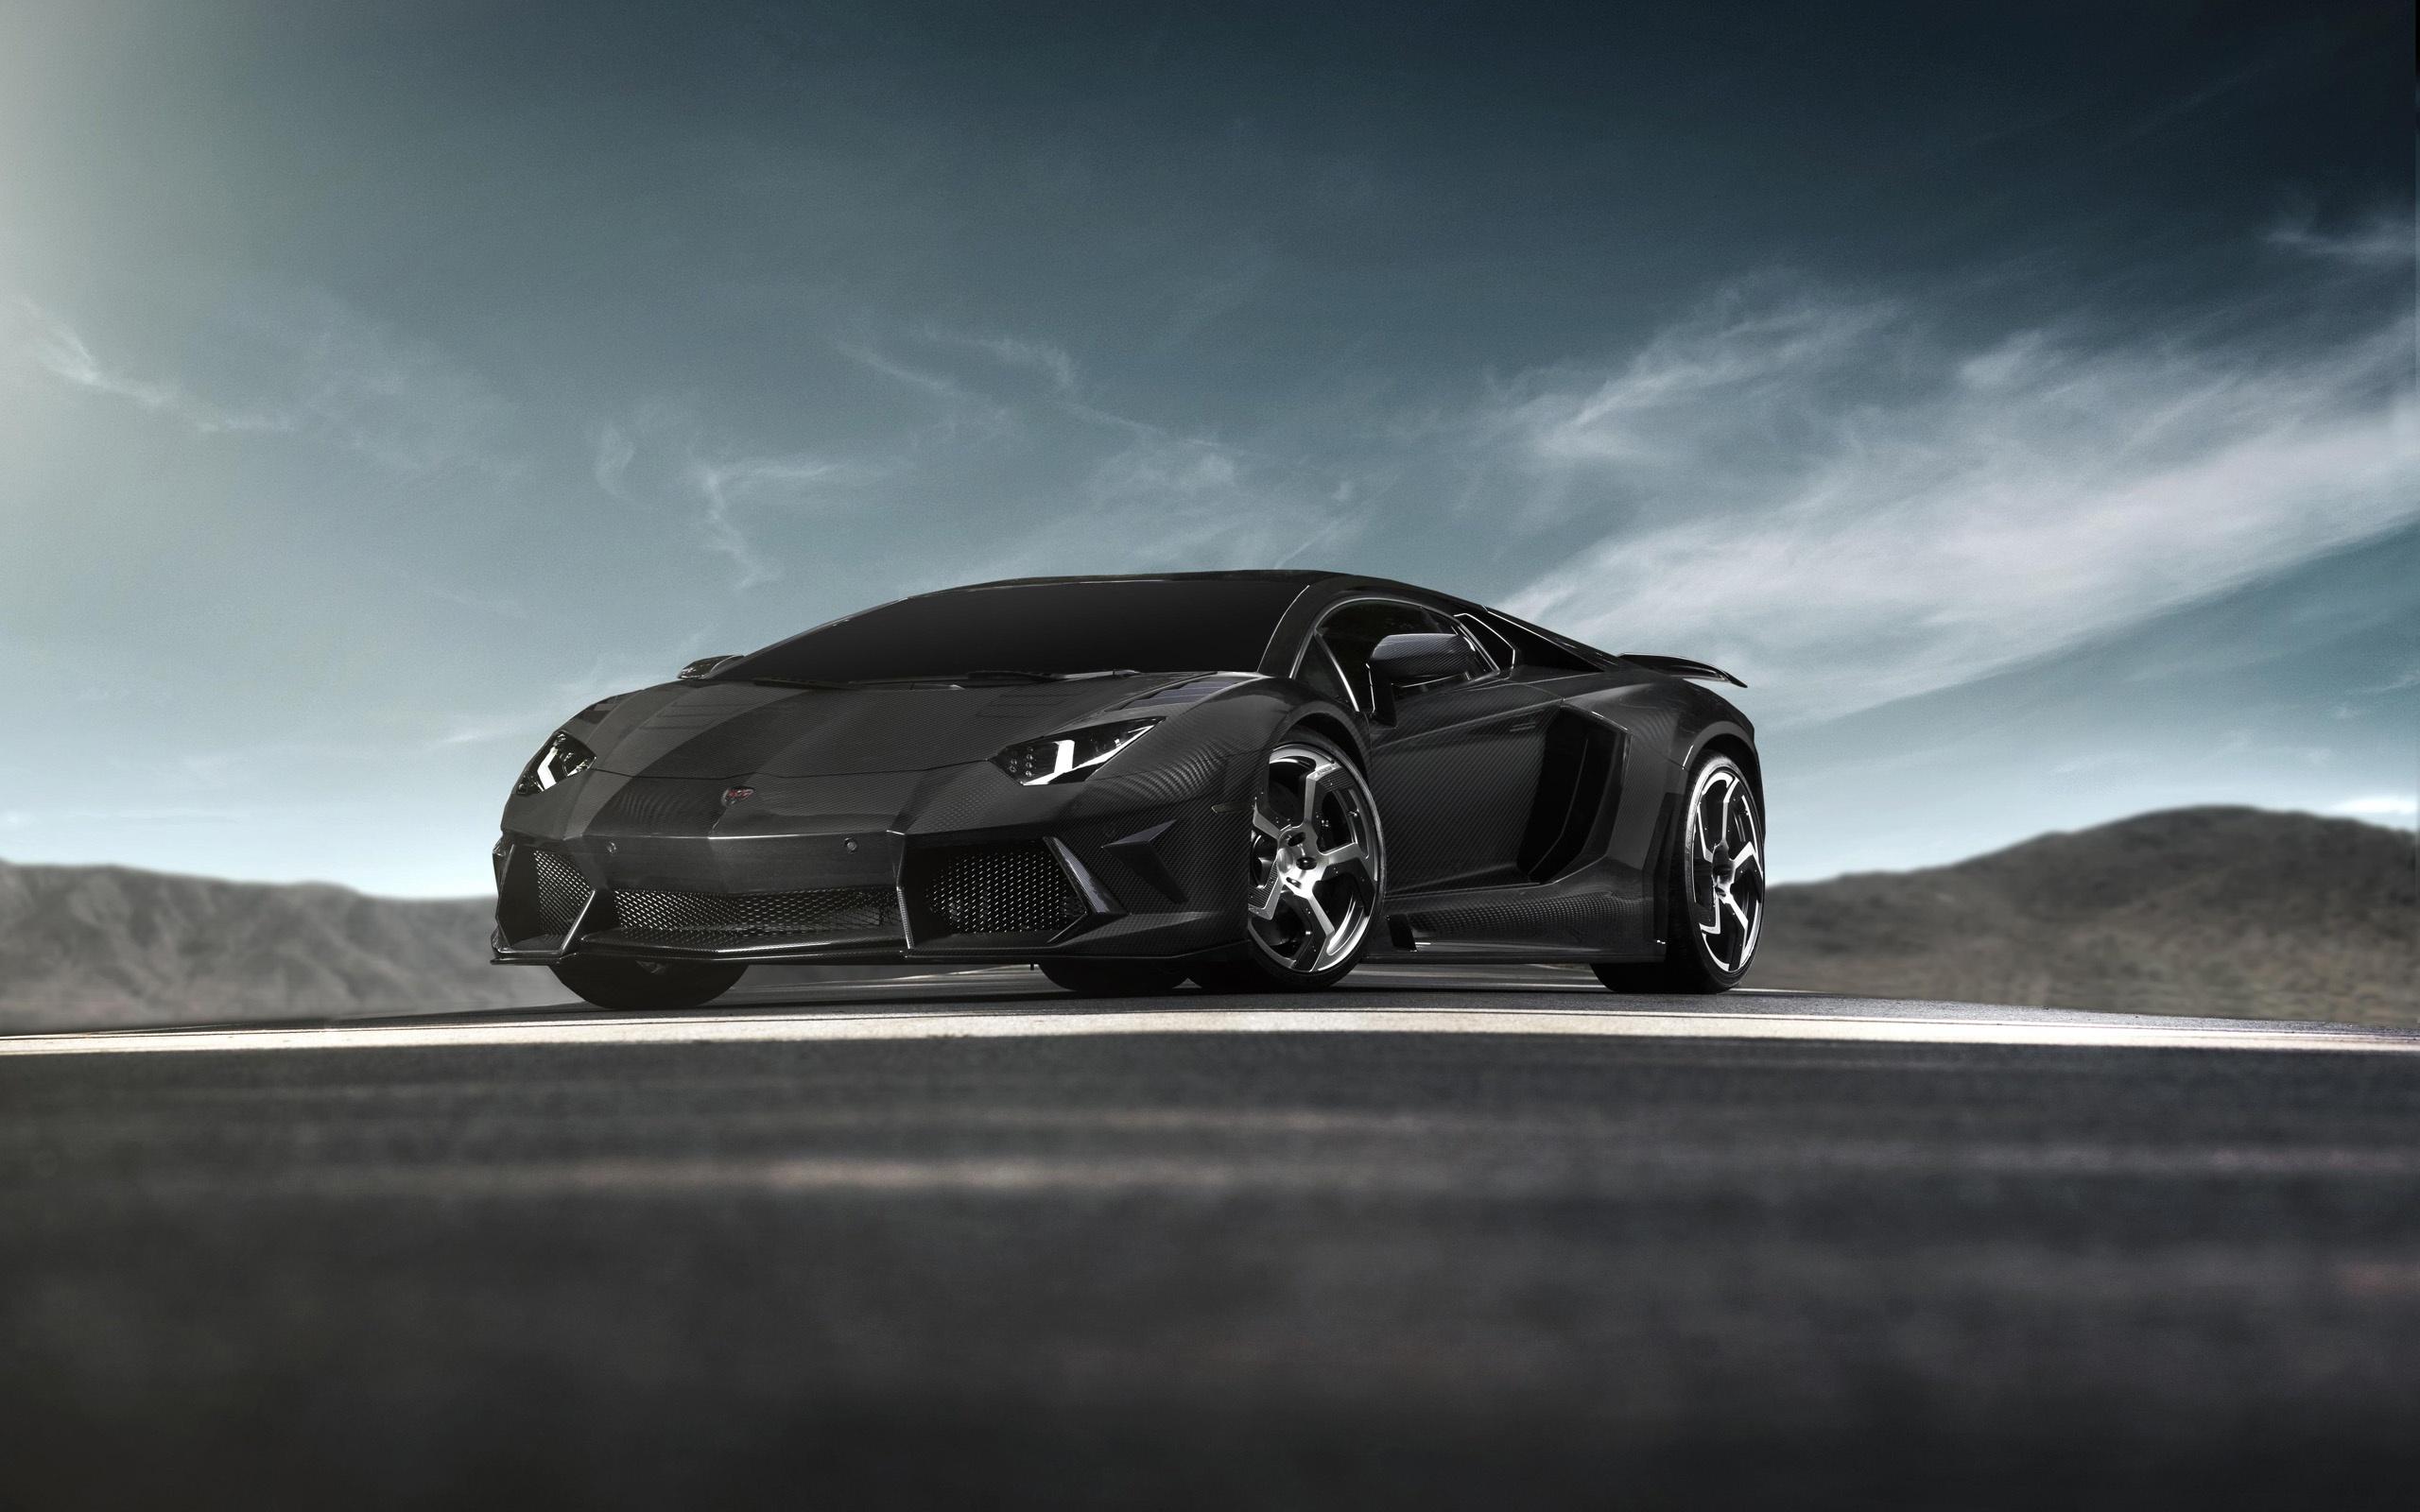 Mansory Lamborghini Aventador Carbon Wallpaper for 2560 x 1600 2560x1600